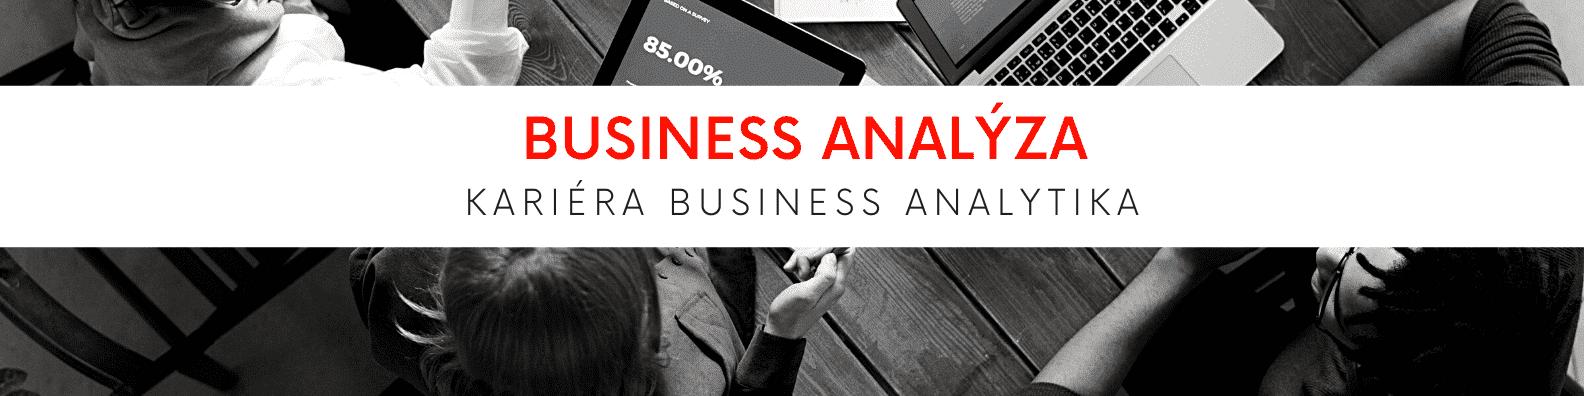 business analytik kariéra, business analýza vývoj